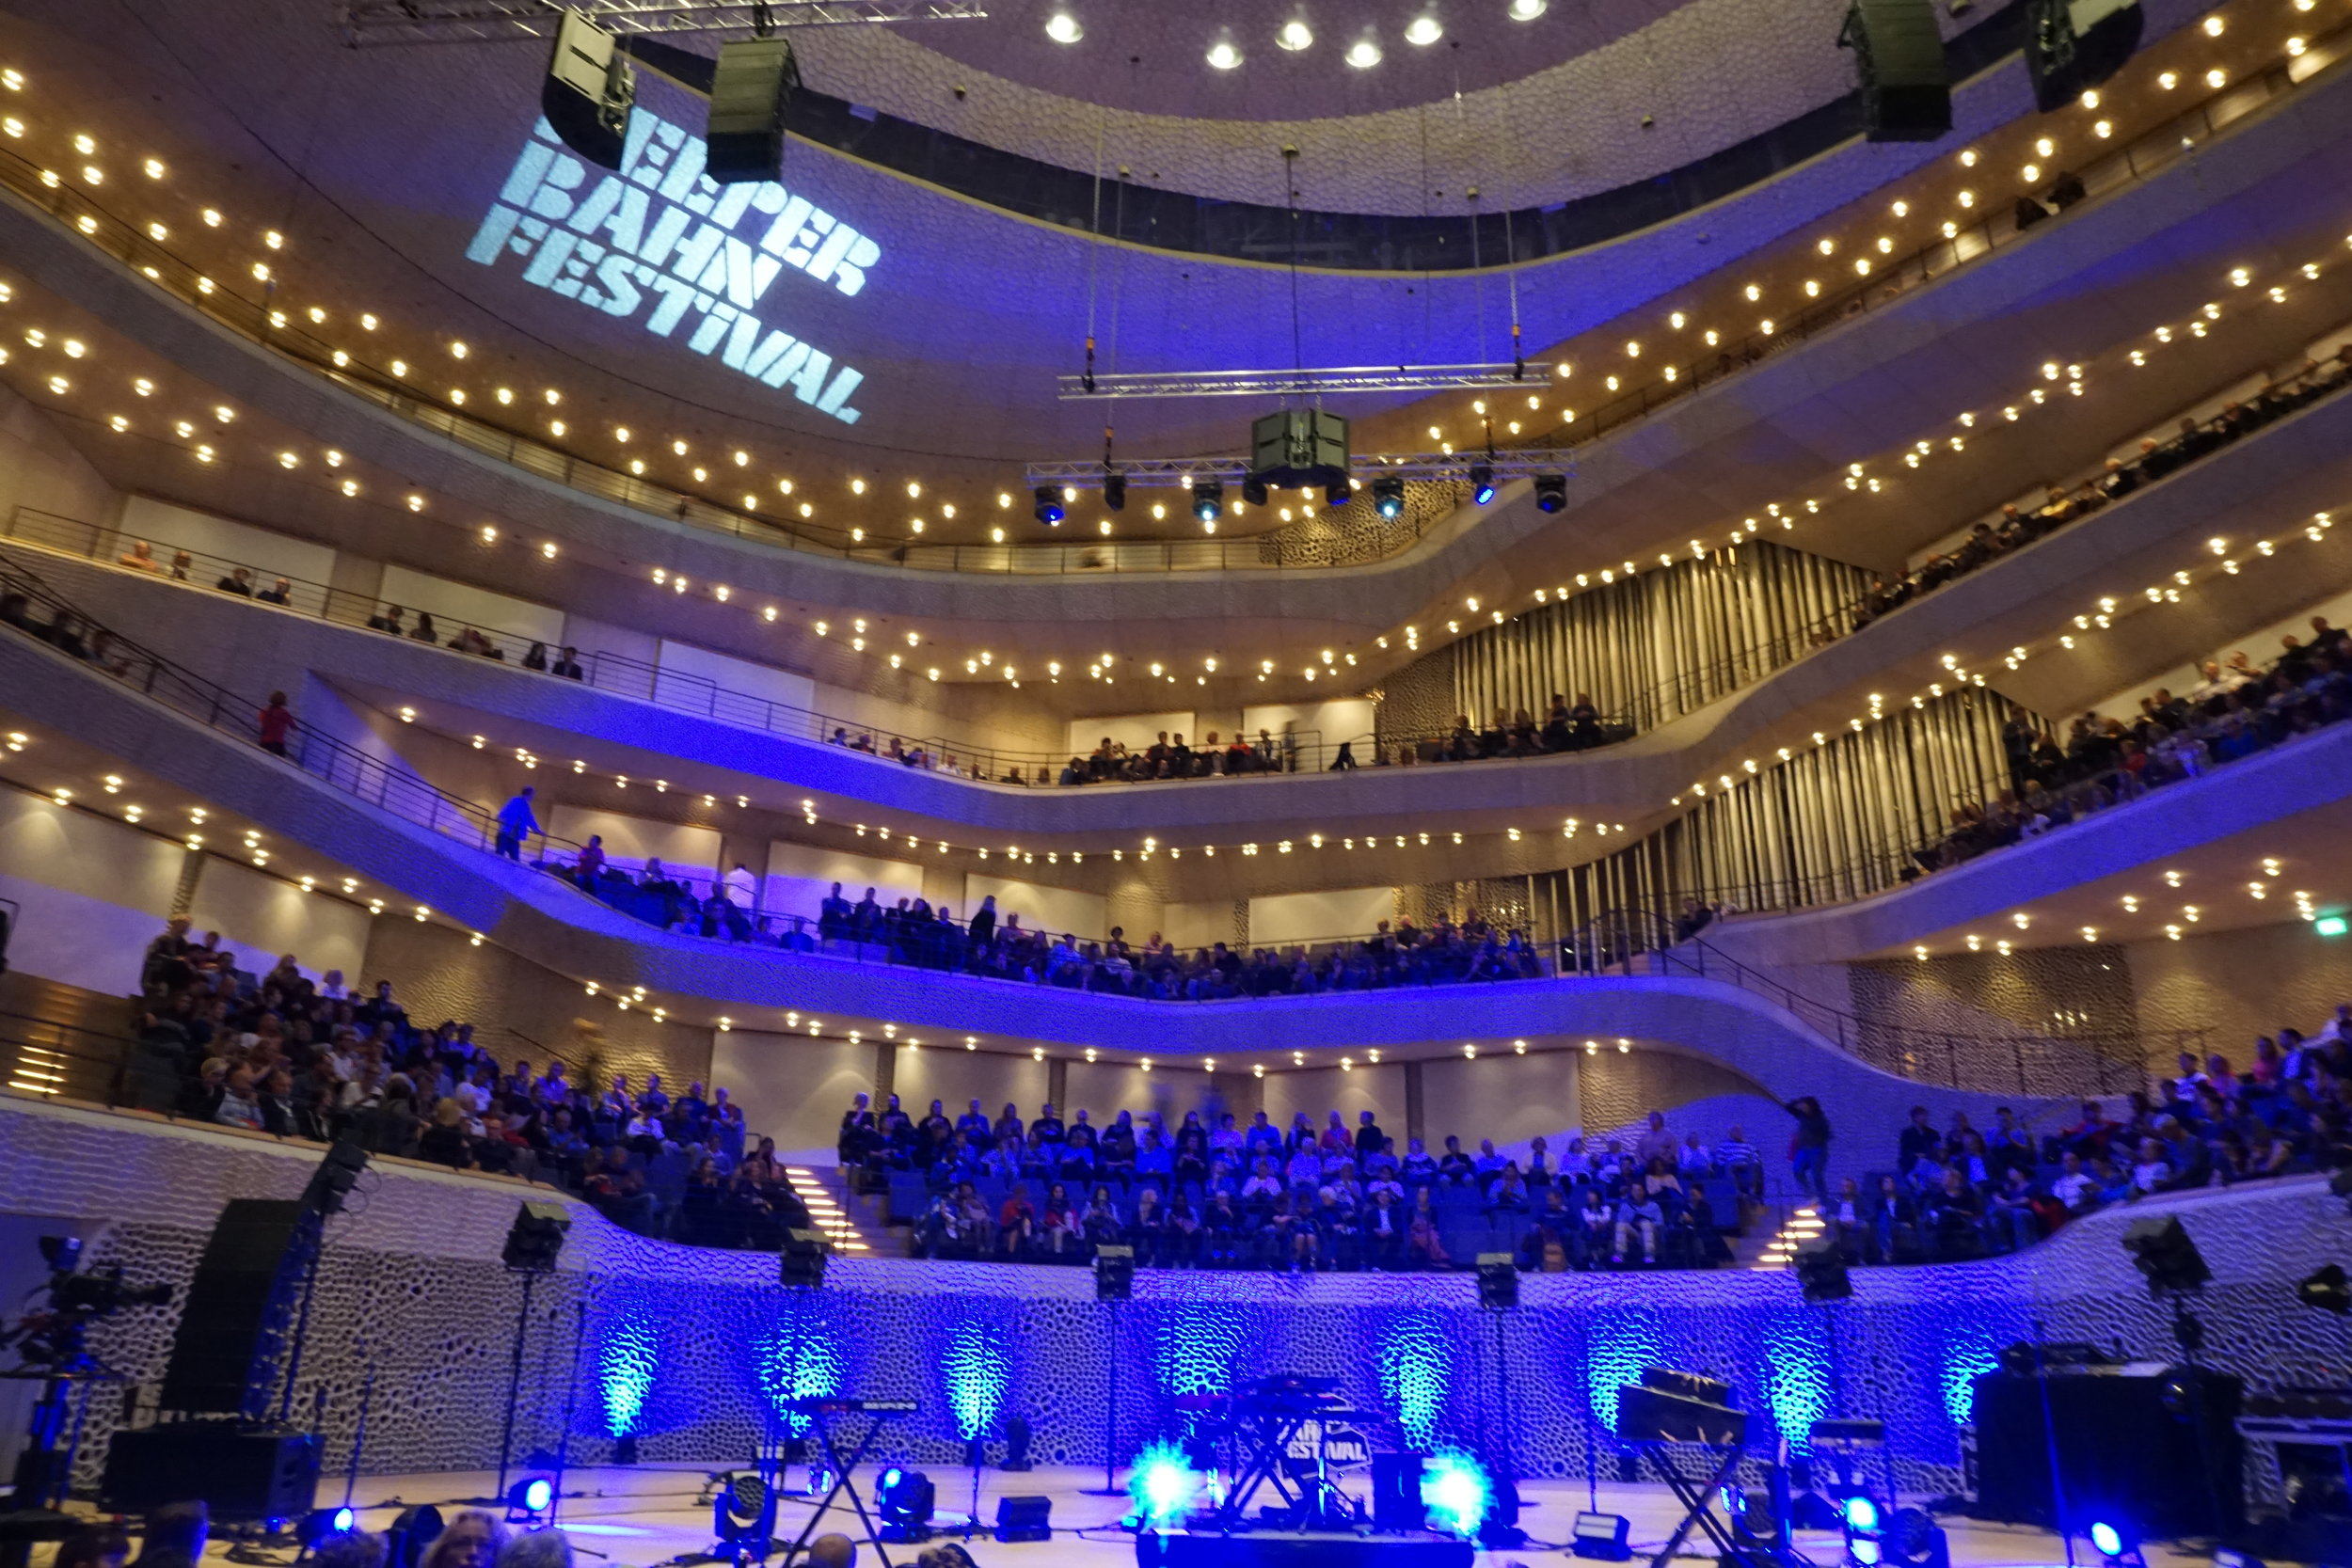 Elbphilharmonie Main Performance Hall